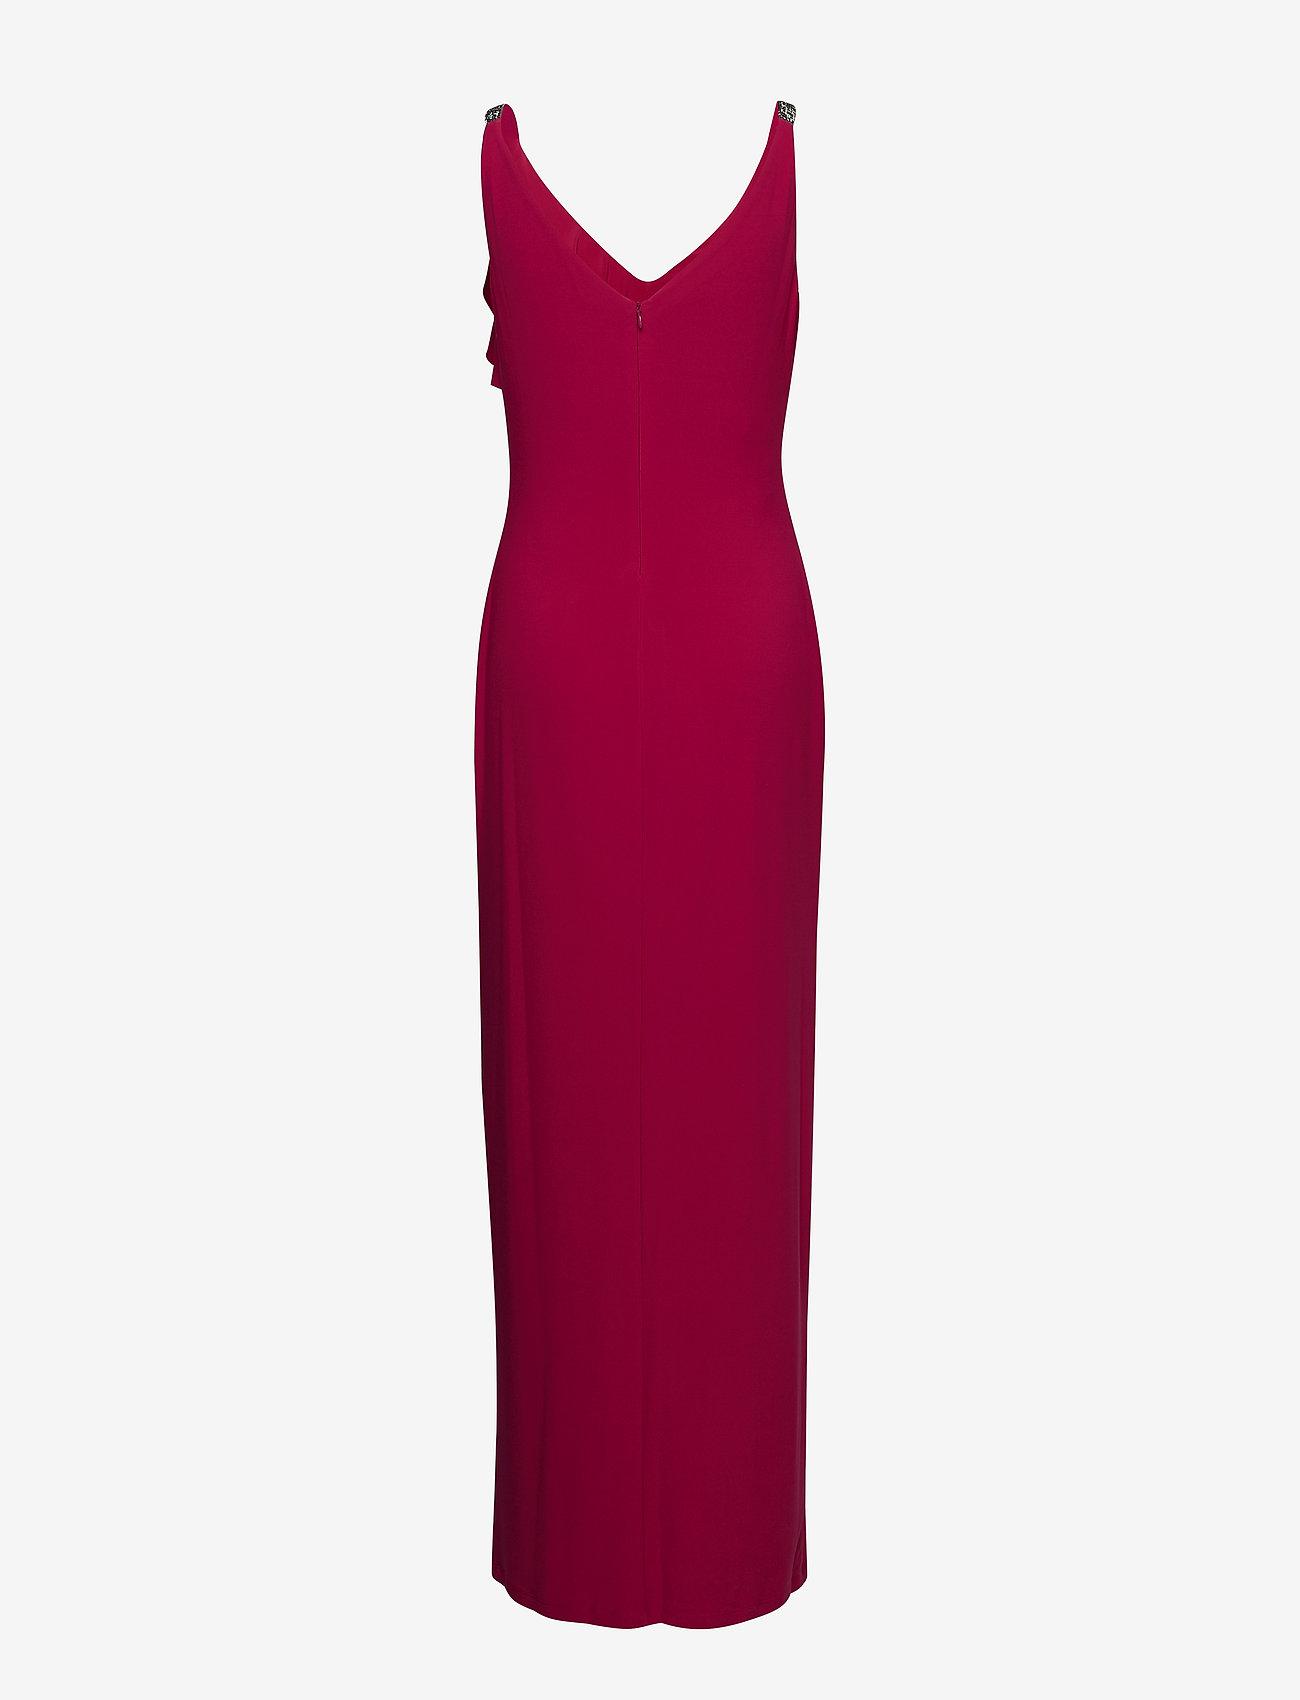 Voriana-sleeveless-evening Dress (Bright Orchid) - Lauren Ralph Lauren z5xDvn